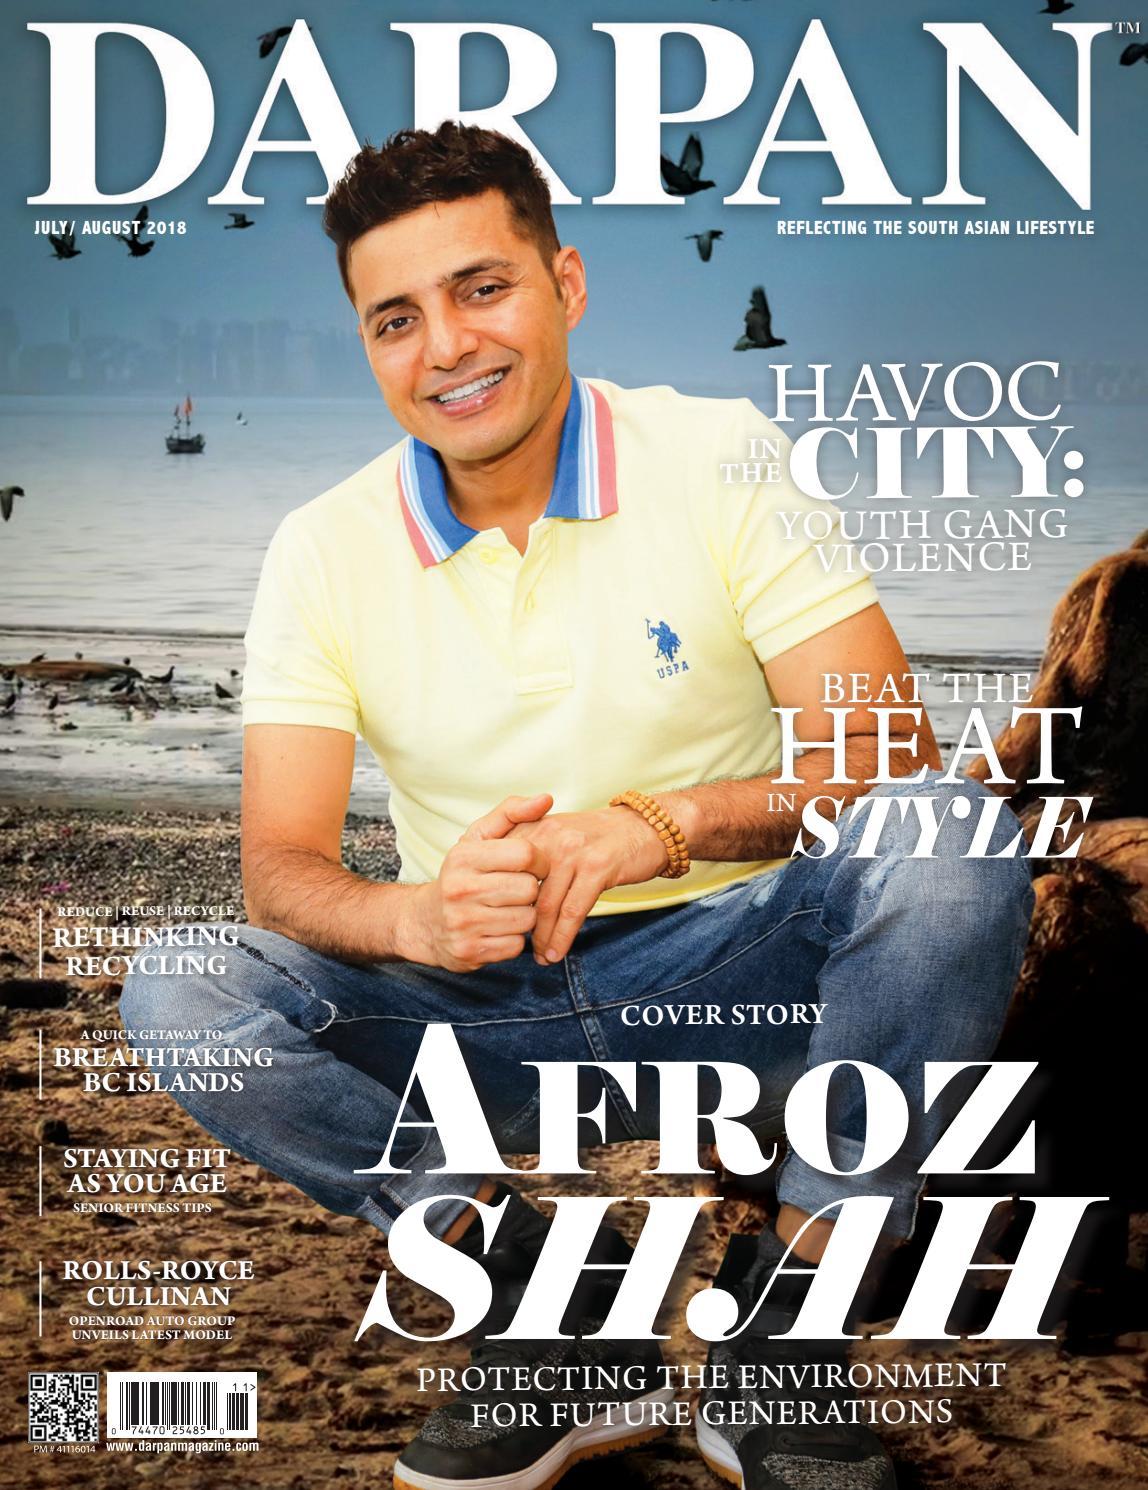 31ac3771095 DARPAN Magazine- JULY 2018 by Darpan Magazine - issuu